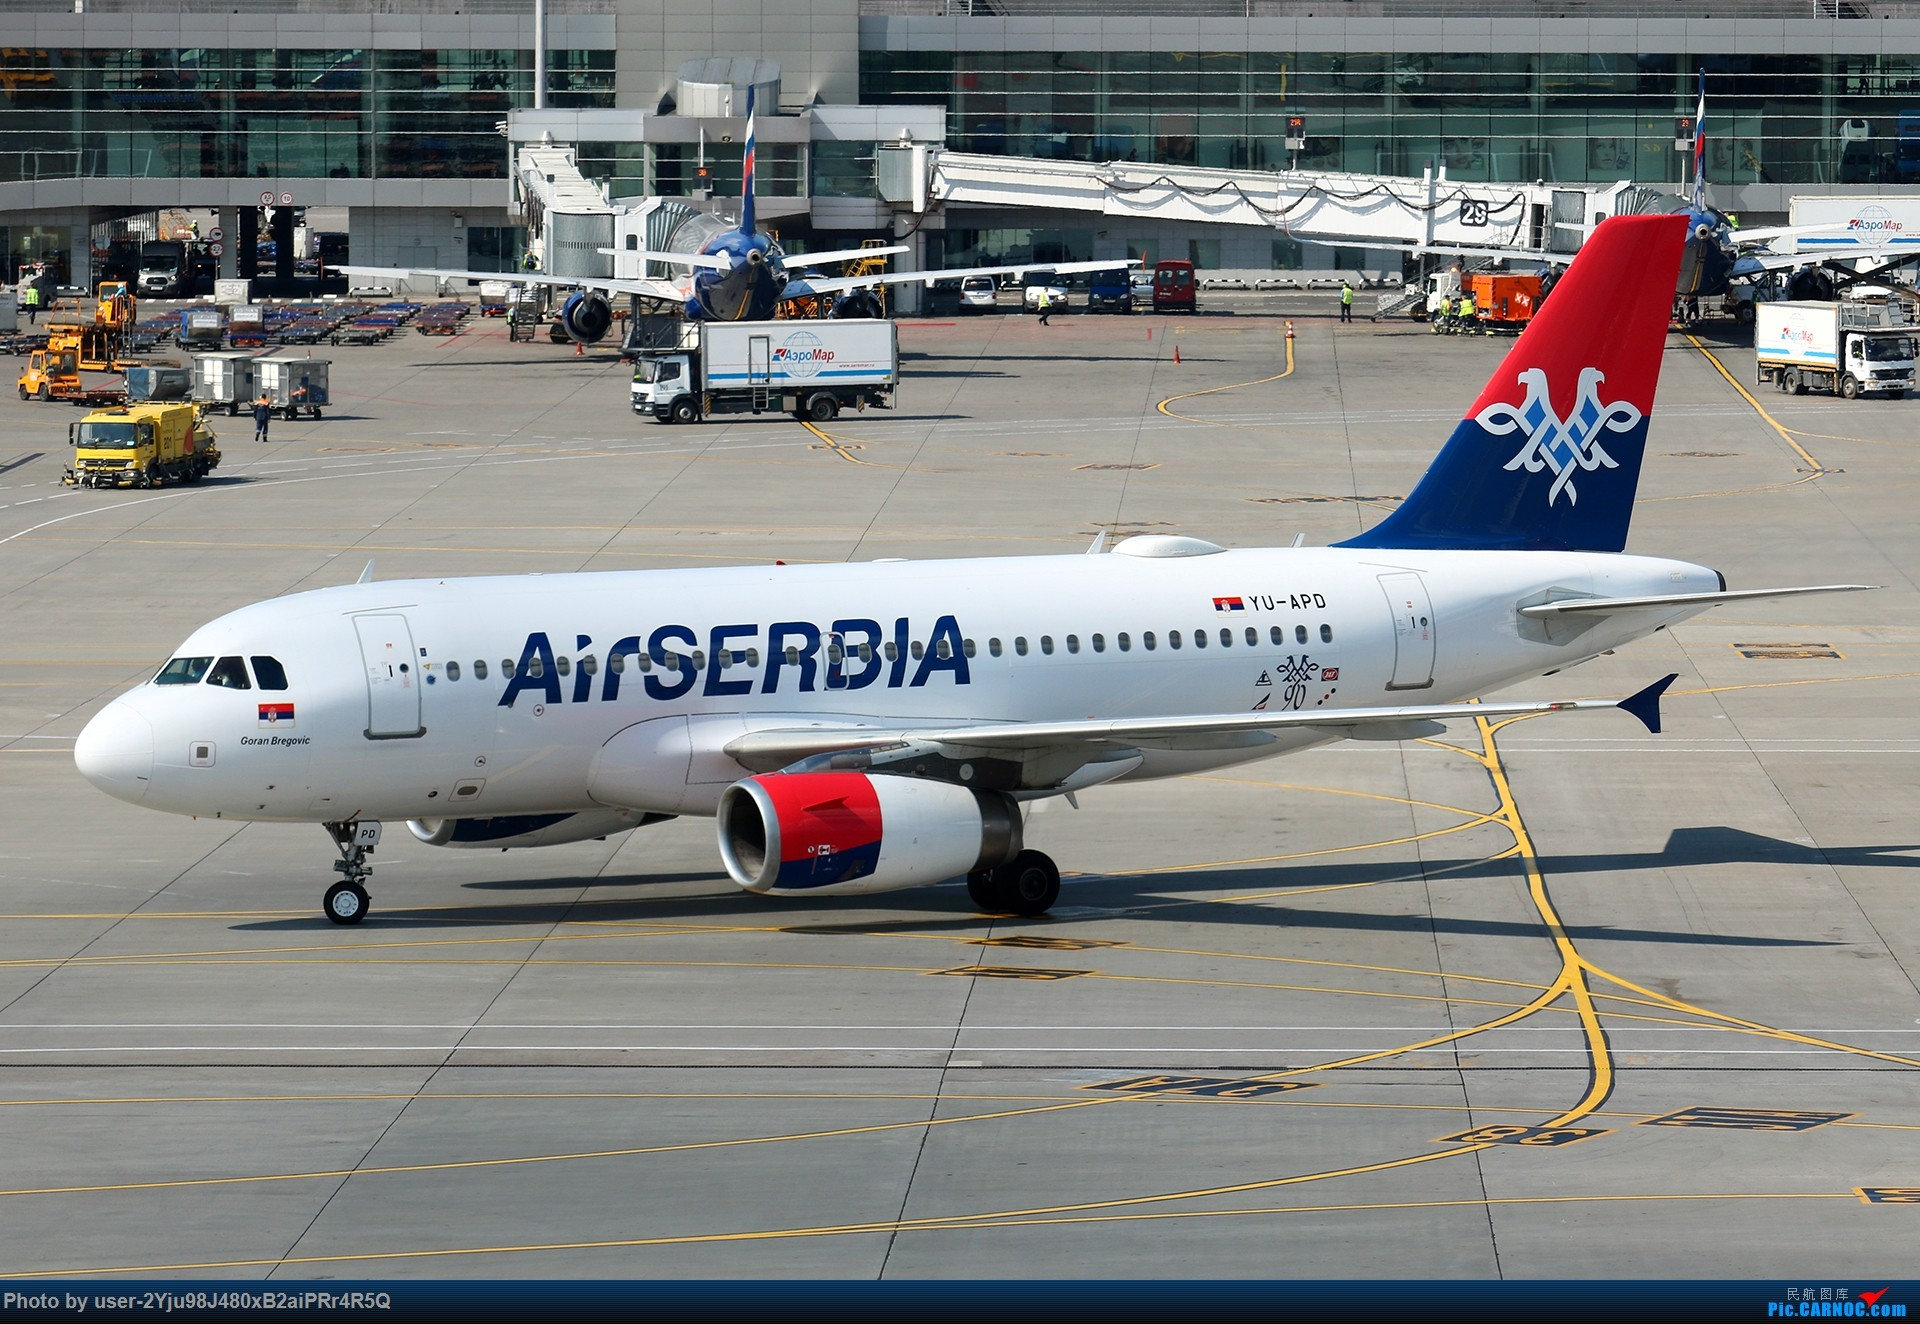 Re:[原创]LIULIU|Sheremetyevo的漫游|其他篇 AIRBUS A319-132 YU-APD 俄罗斯谢诺梅杰沃机场